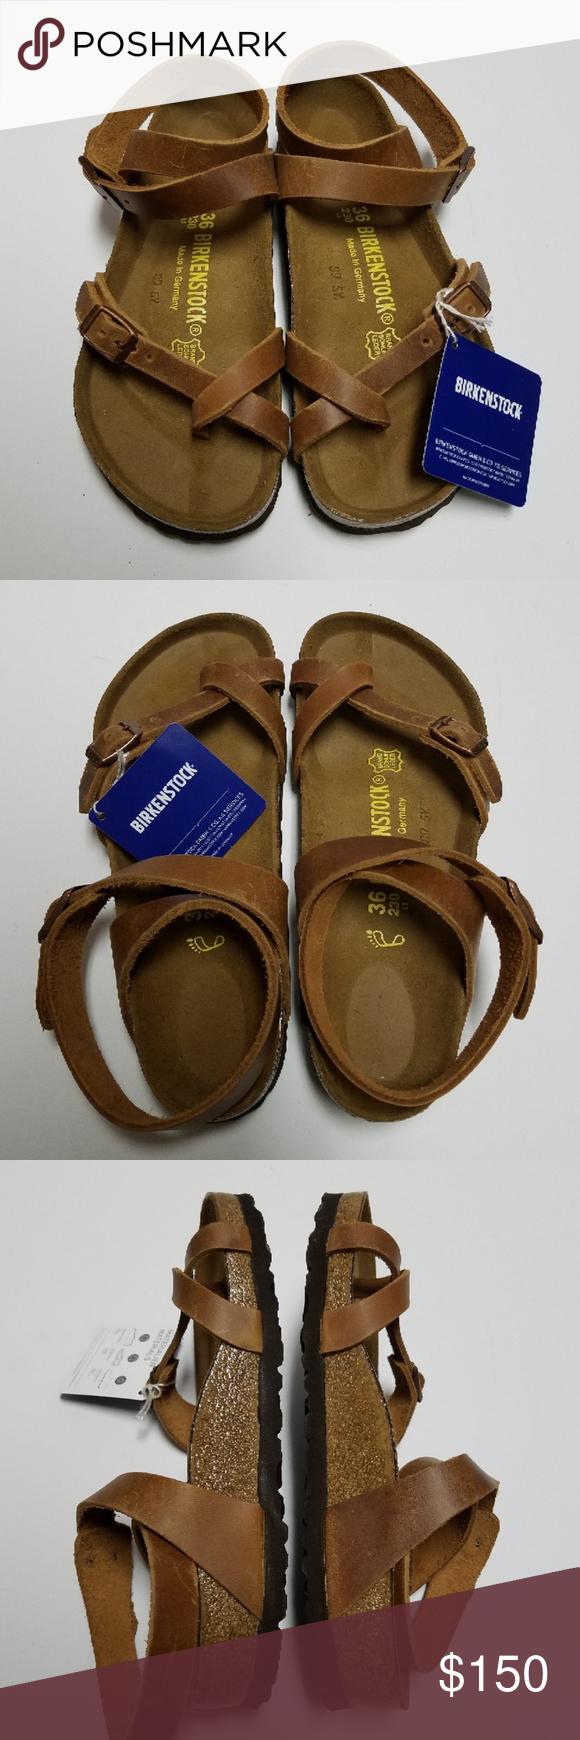 9c370e82b1b3 New Birkenstock Yara Antique Brown Sandals 36 Birkenstock Yara Antique  Brown Leather Sandals. Size 36